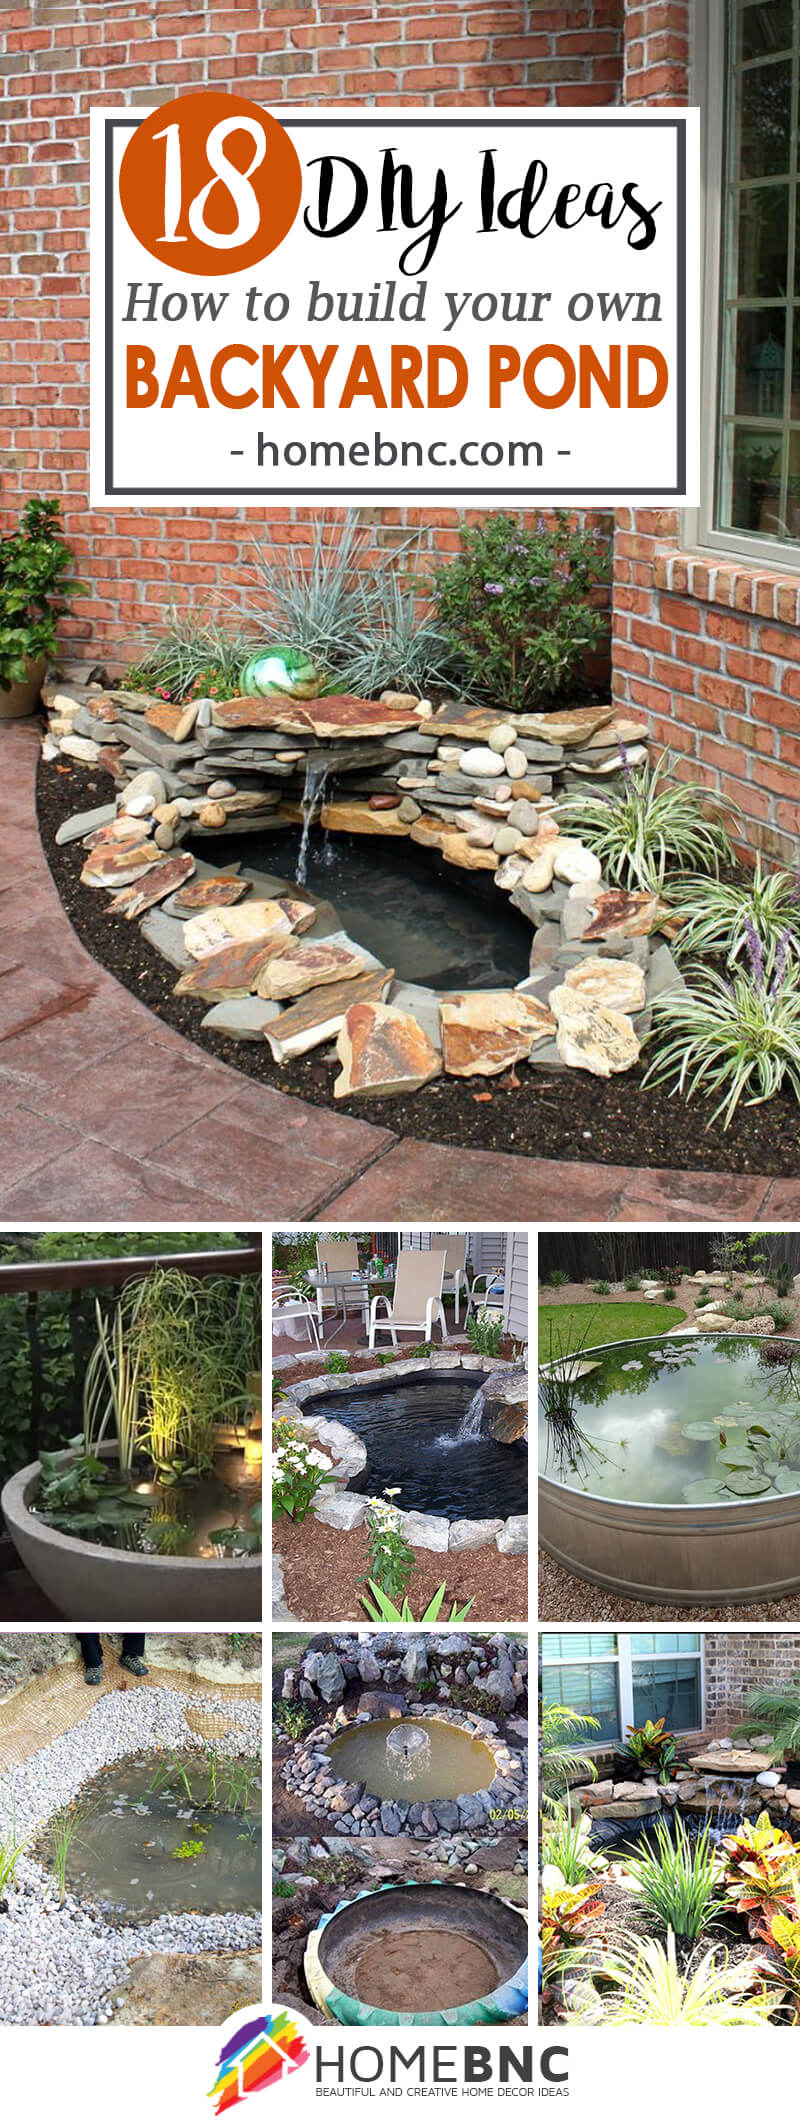 18 Best DIY Backyard Pond Ideas and Designs for 2017 on Pond Ideas Backyard id=80086